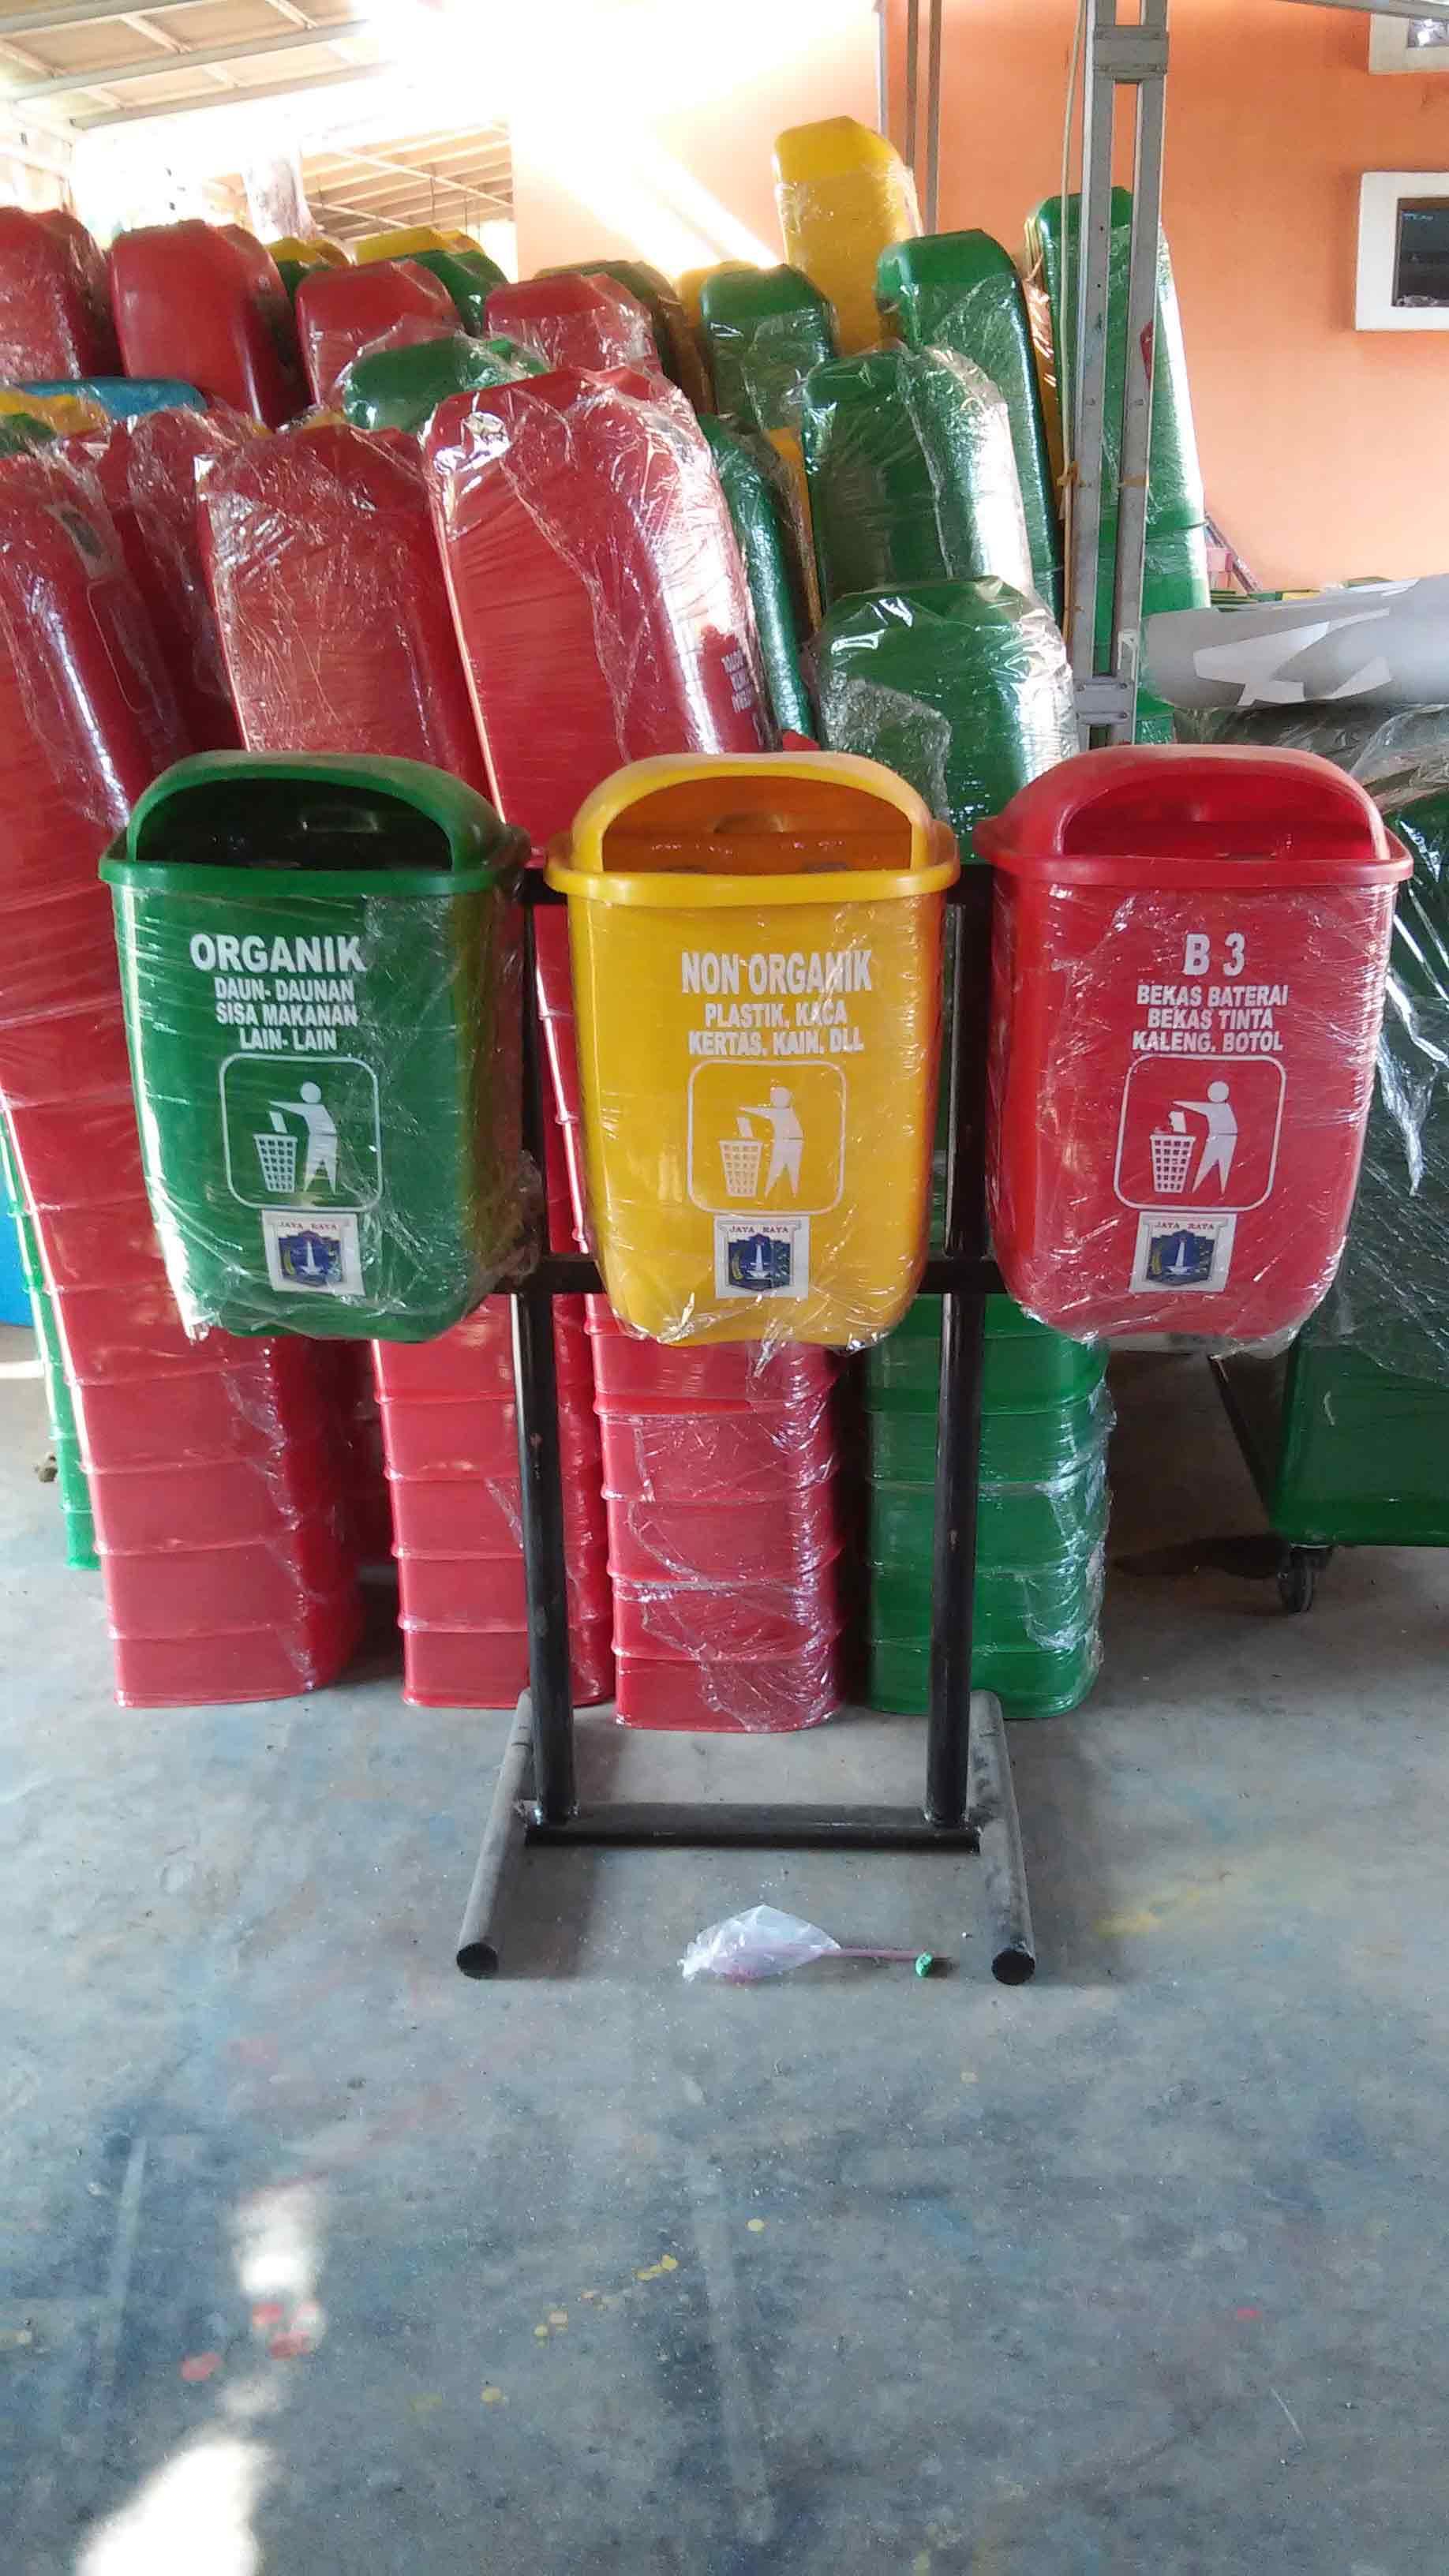 tong-3-in-1,Jual tong sampah fiber, harga tong sampah fiber murah , tong sampah fiberglass di jakarta